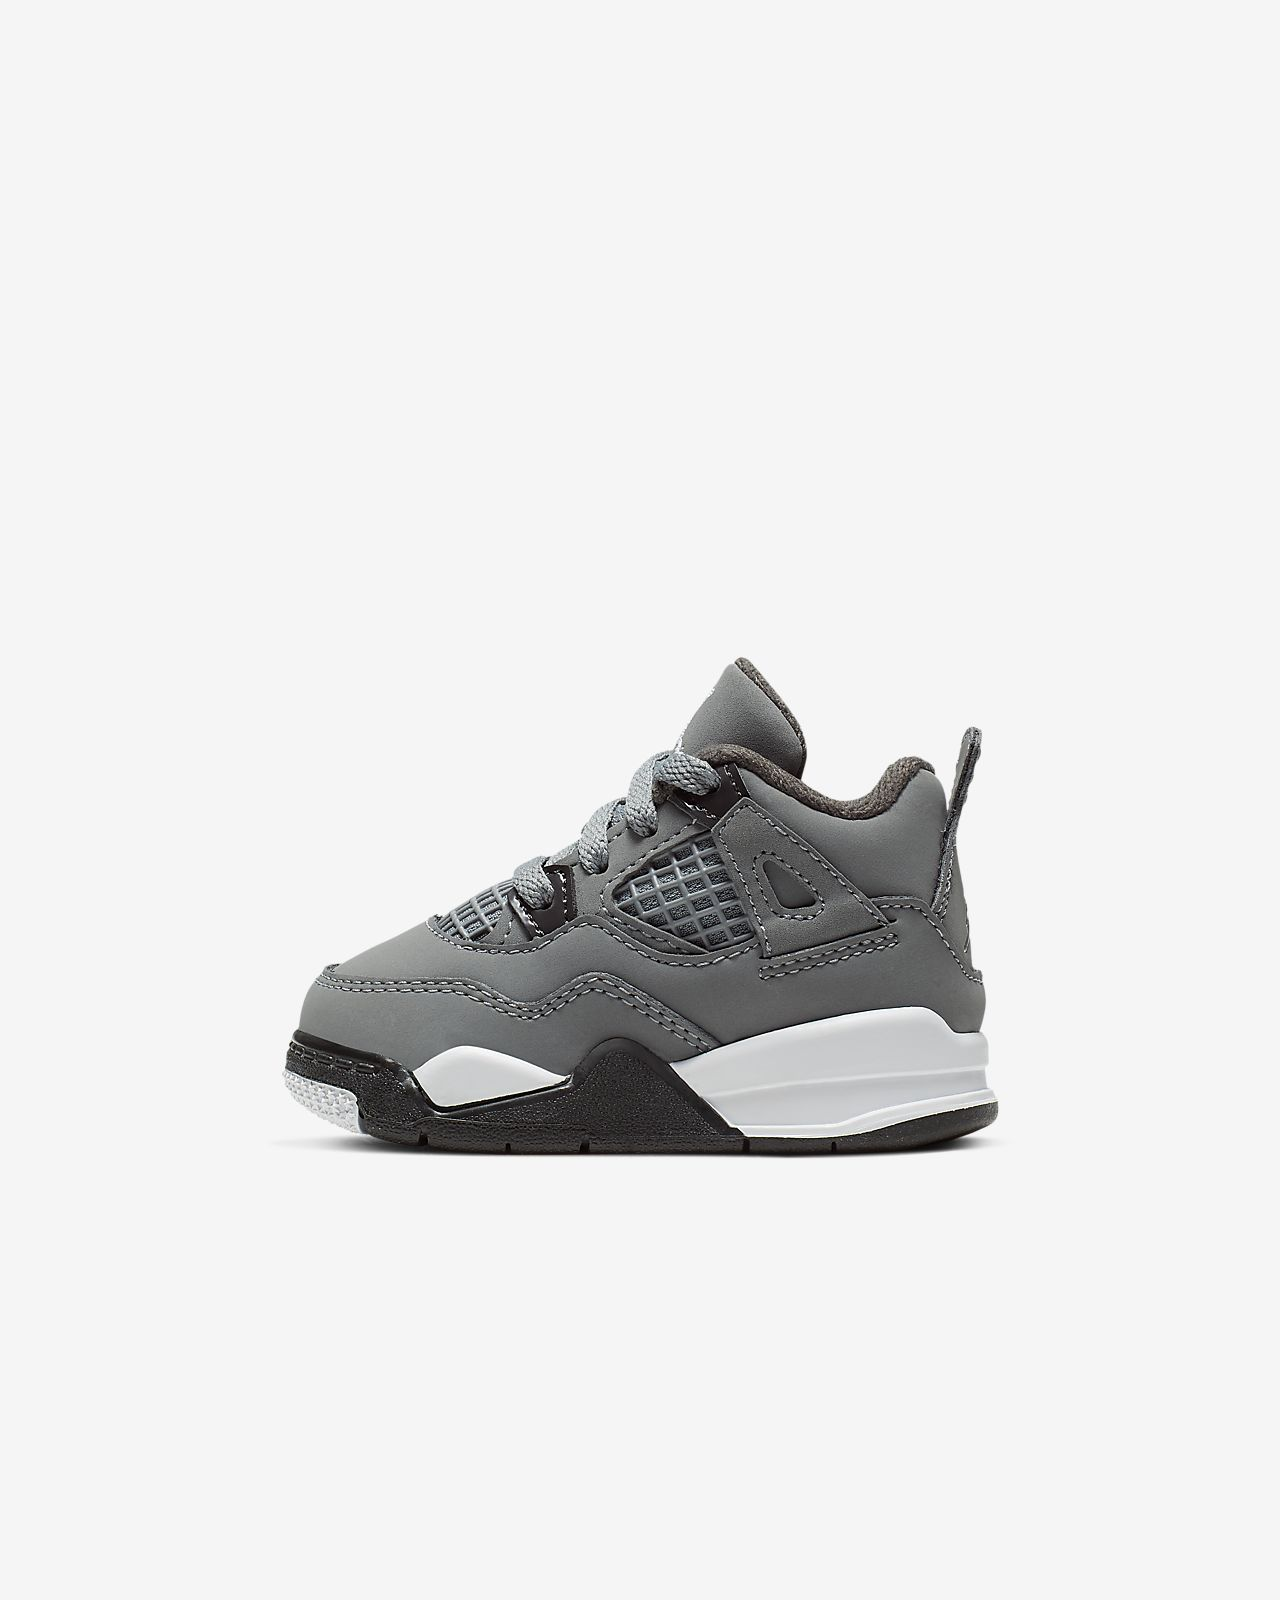 Air Jordan 4 Retro 嬰幼兒鞋款